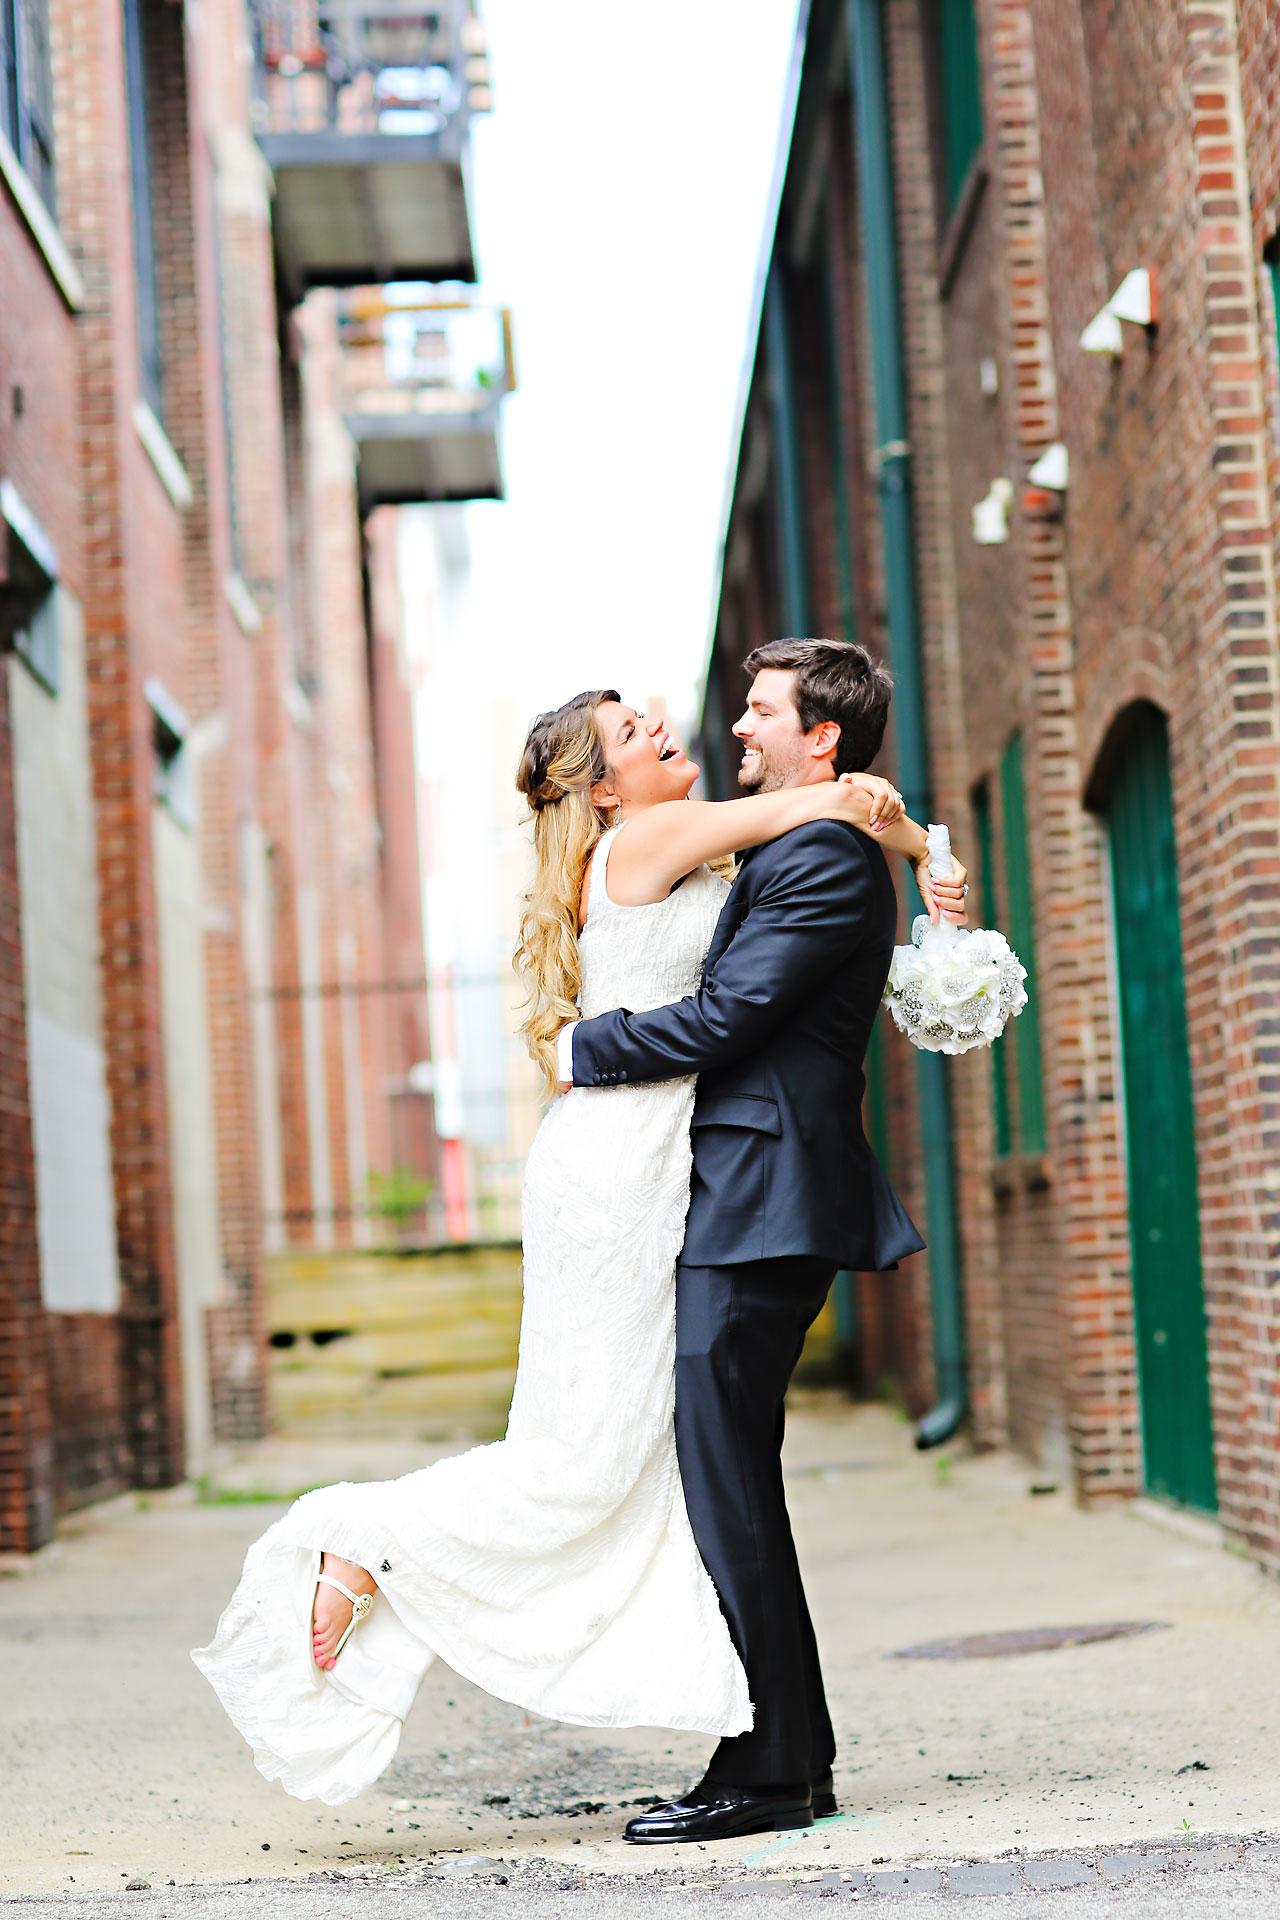 Amy Nick Canal 337 Wedding 120